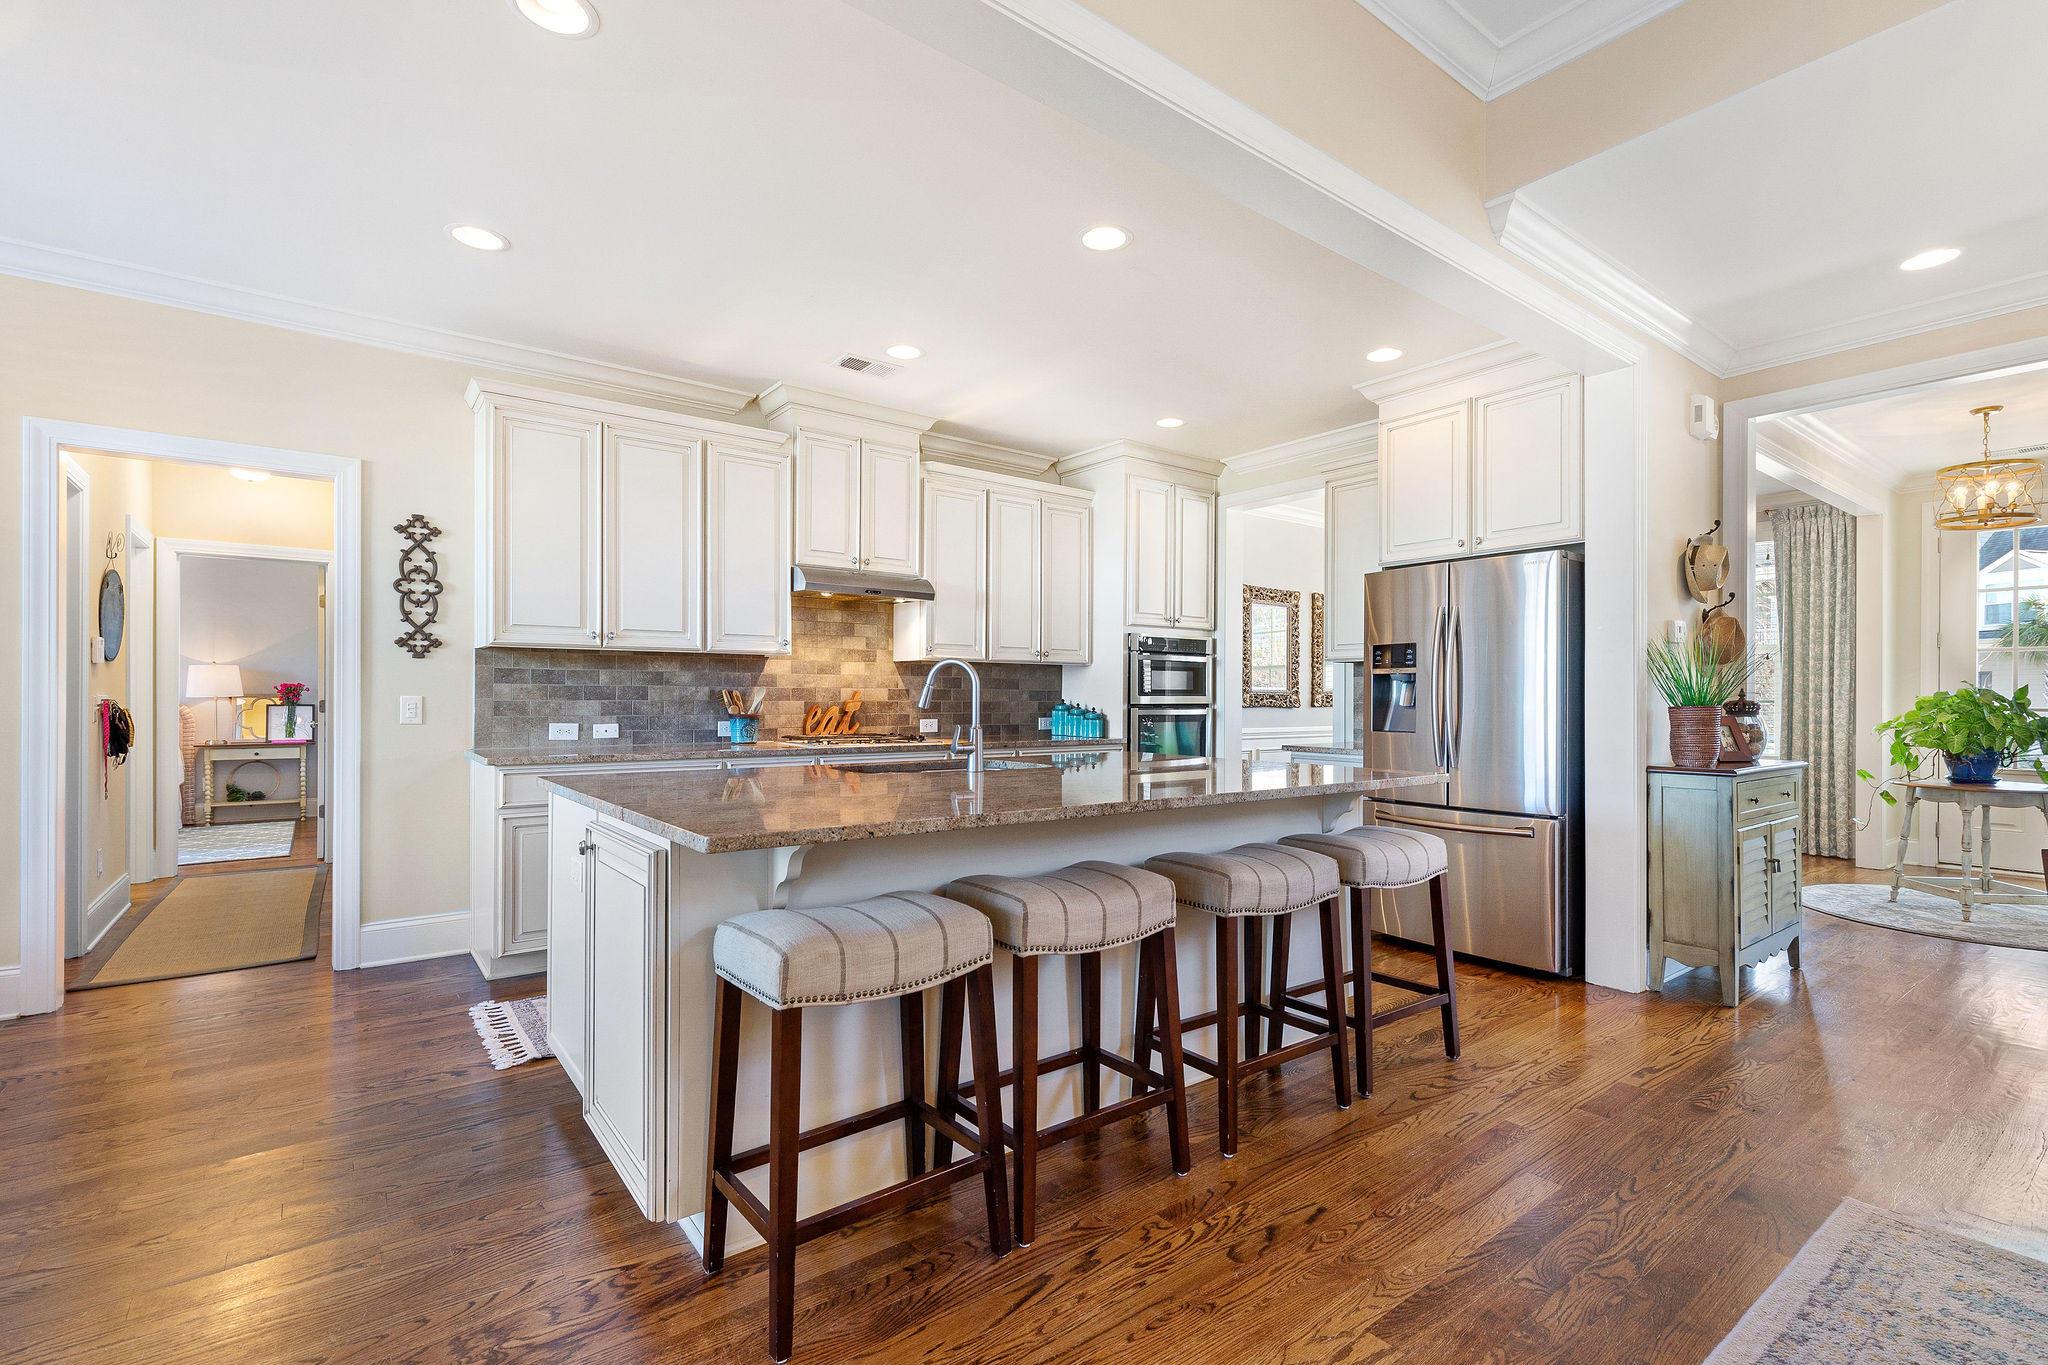 Dunes West Homes For Sale - 3212 Hatchway, Mount Pleasant, SC - 32